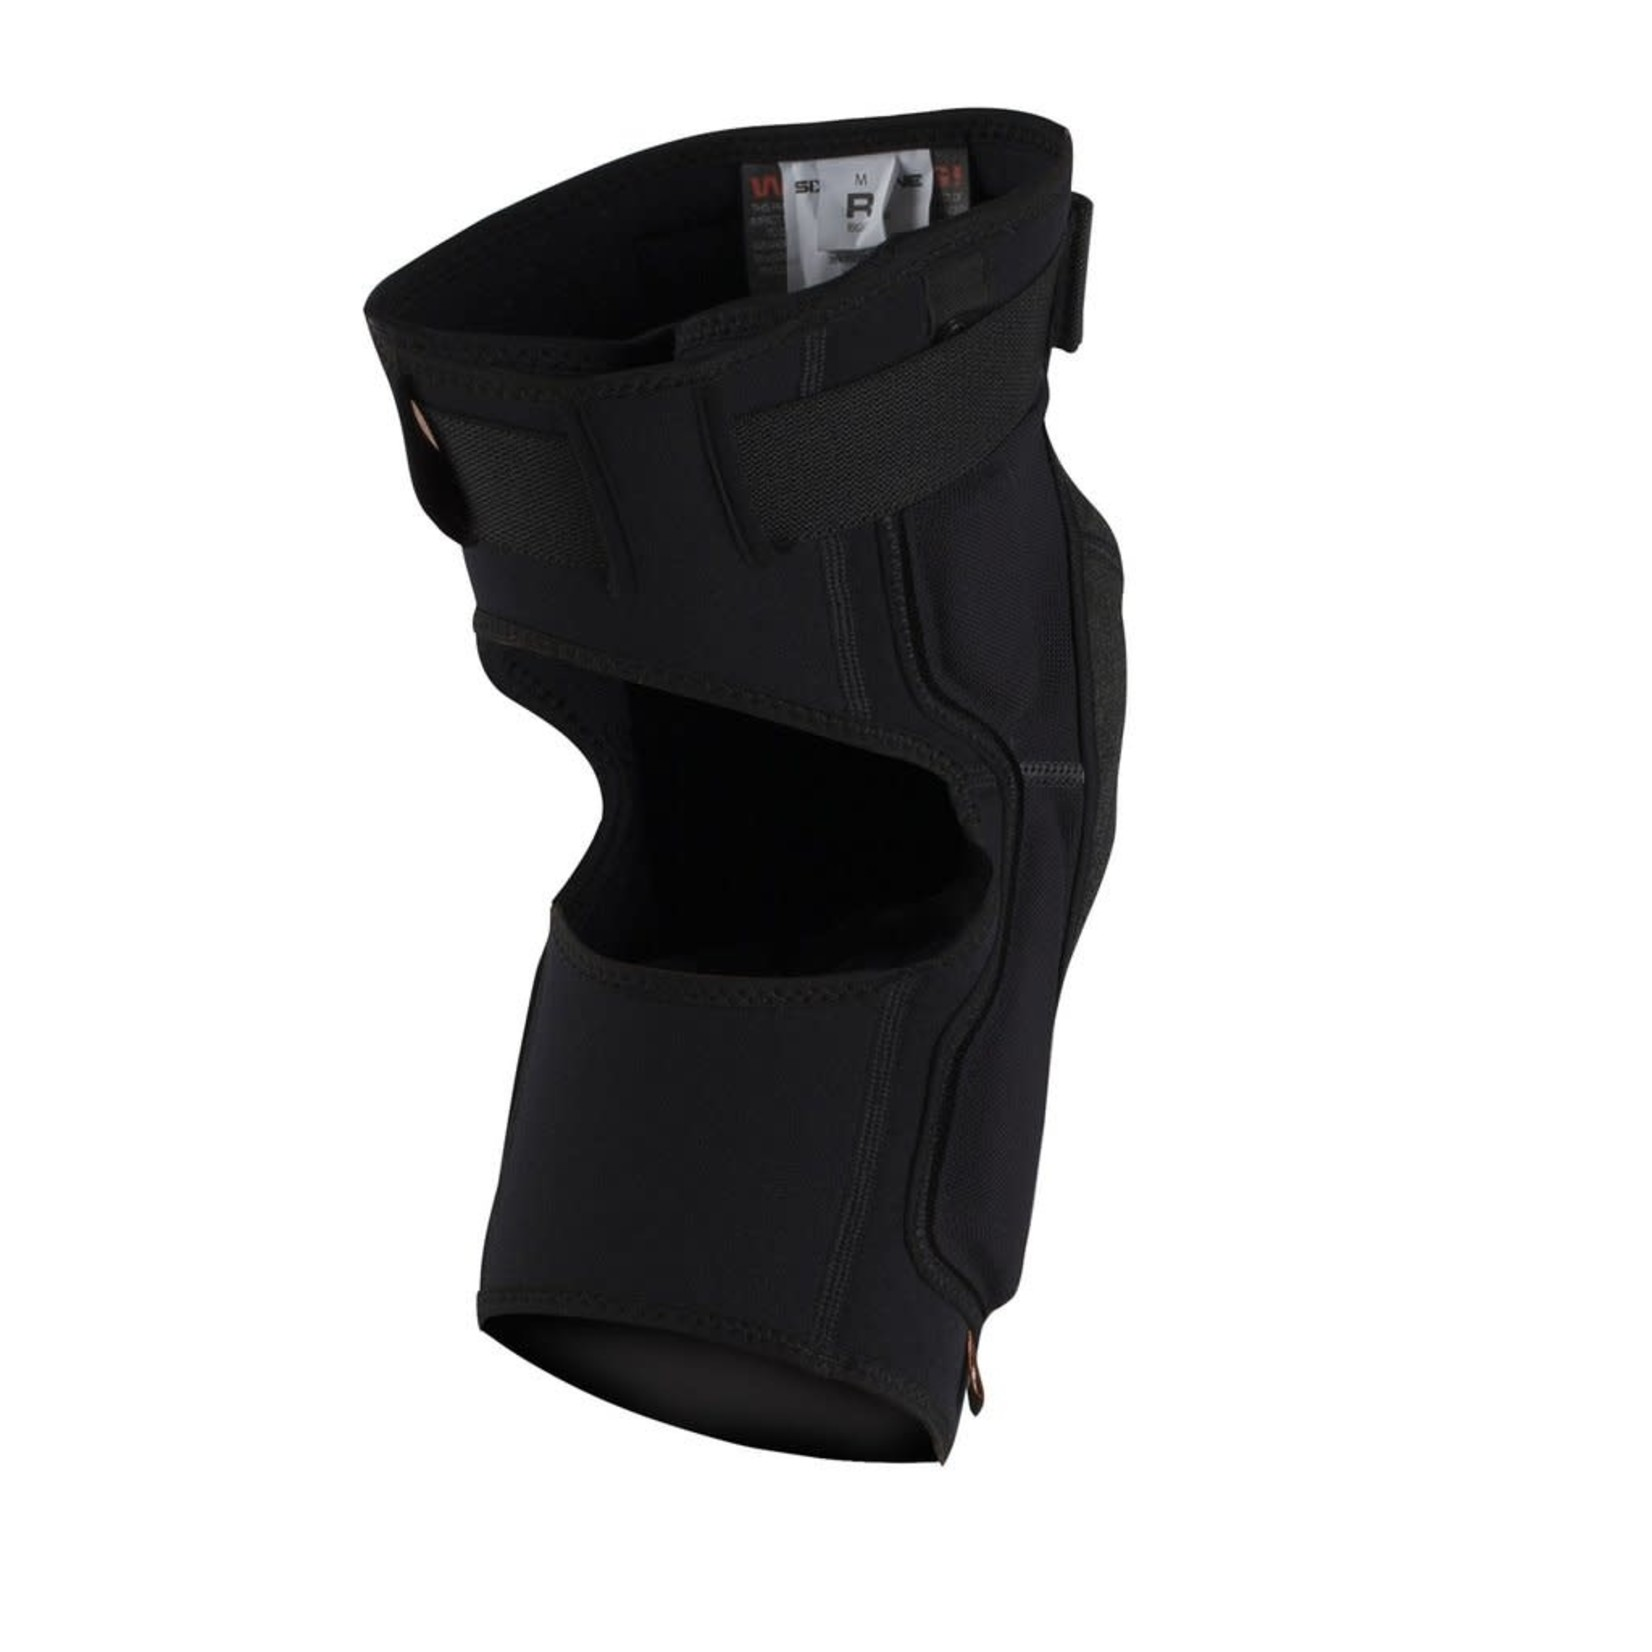 SixSixOne SixSixOne DBO Knee Guards, Black - S